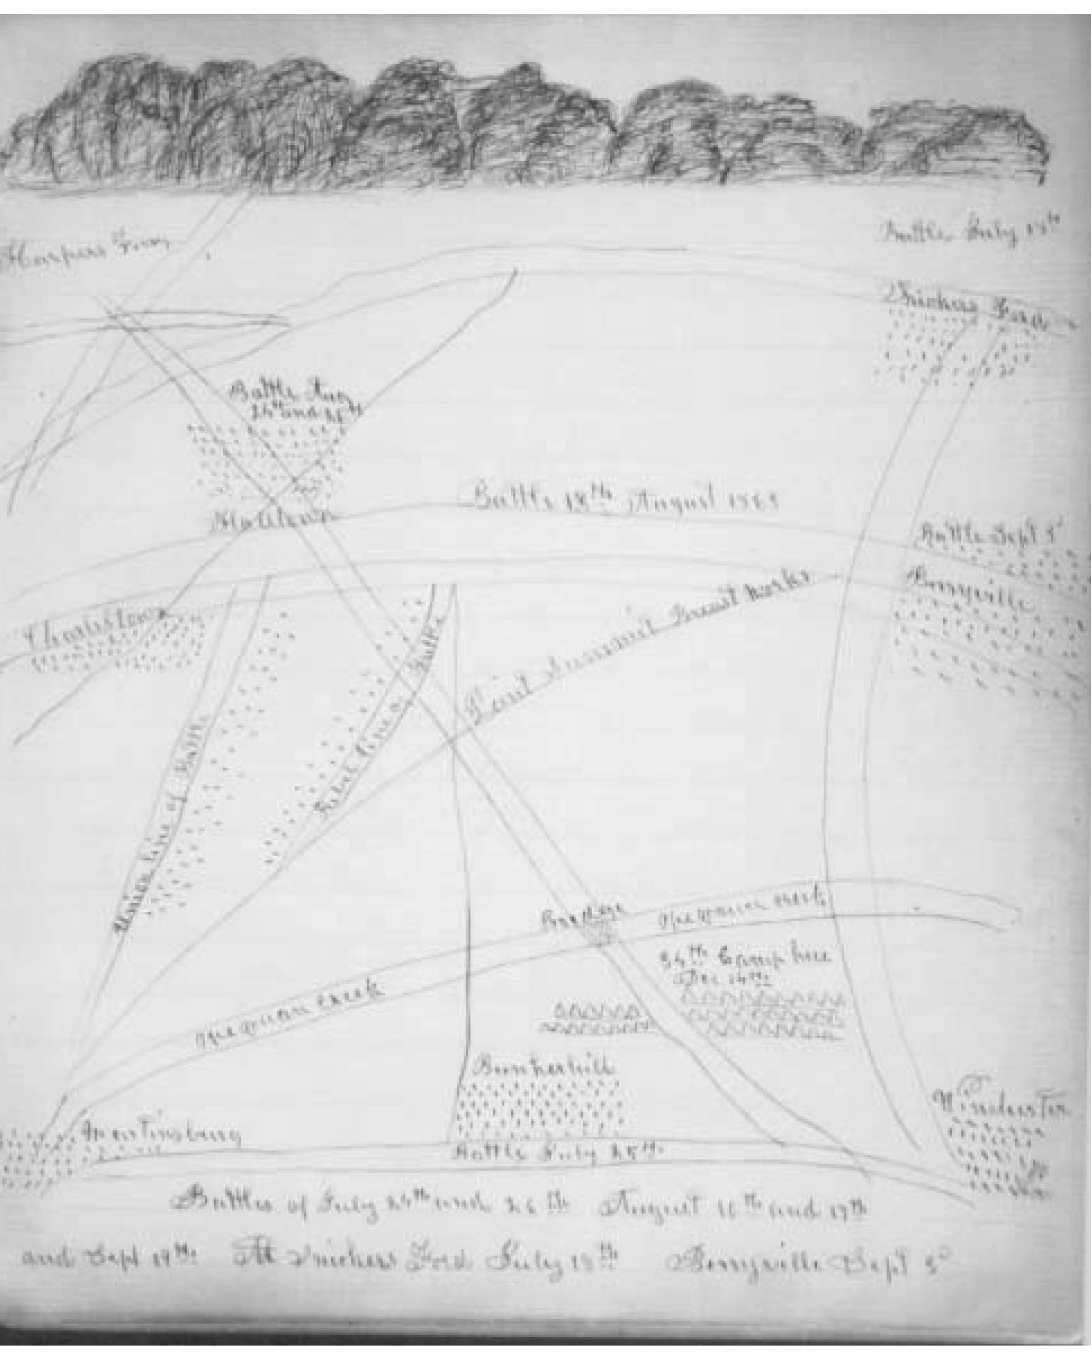 grievo civil war document-4.jpg